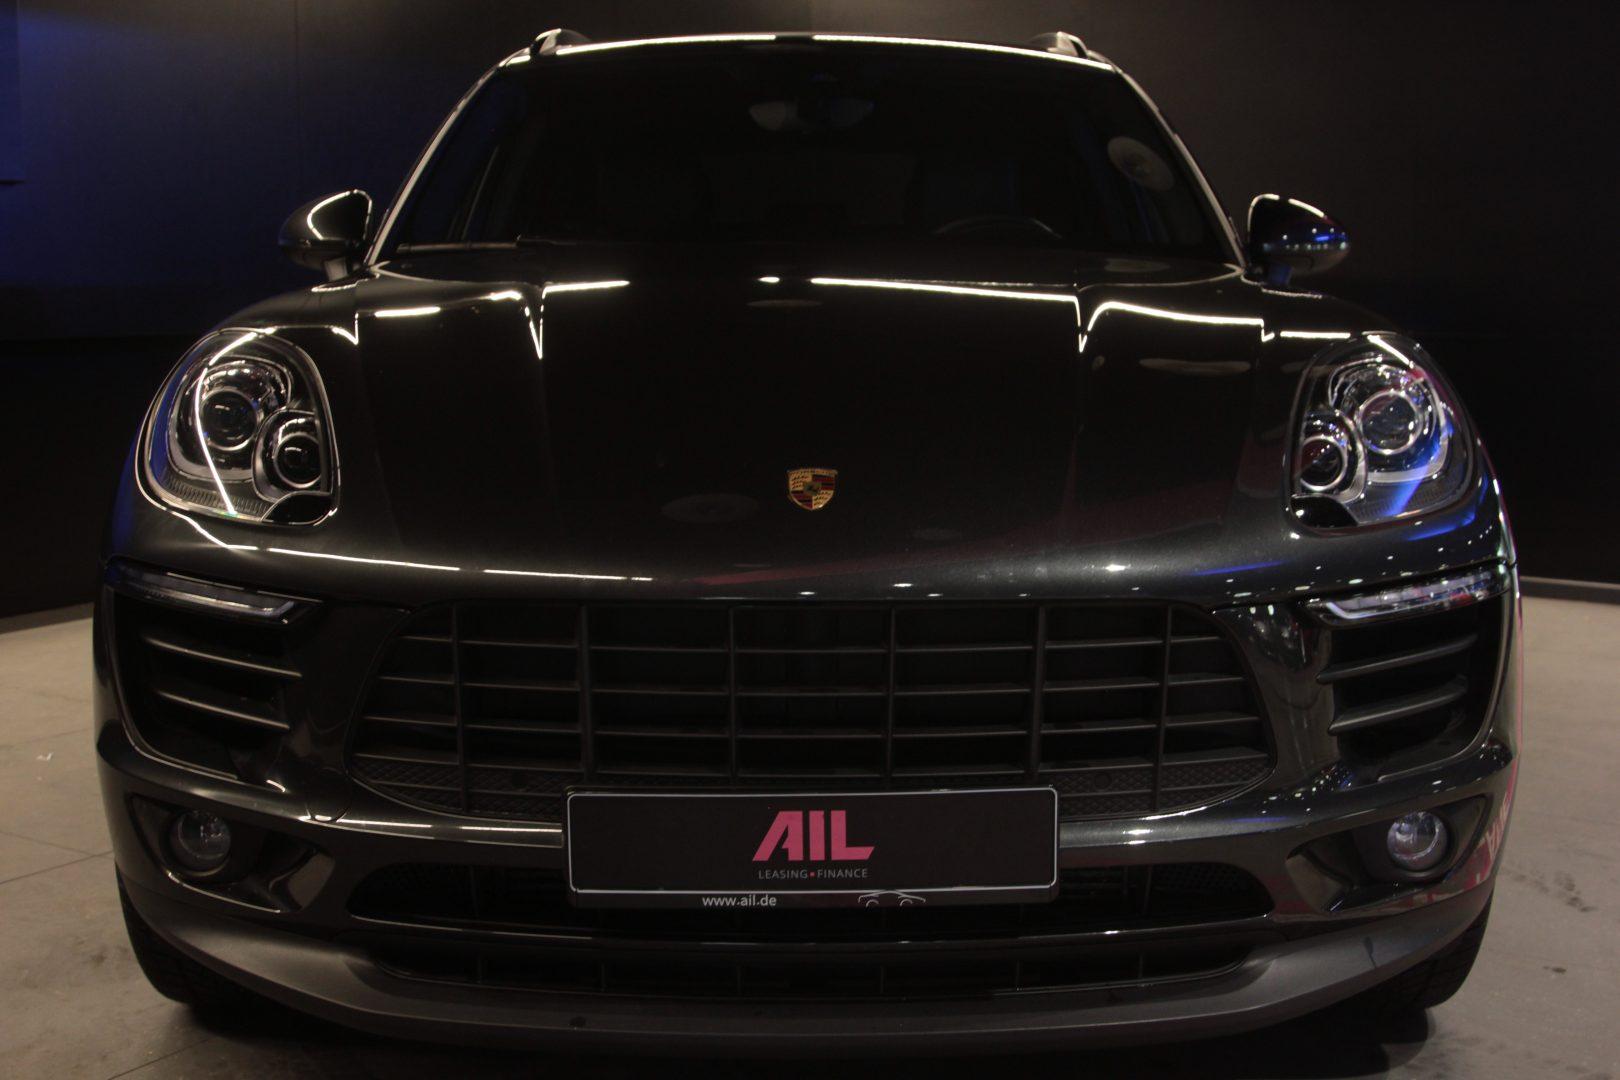 AIL Porsche Macan S Diesel 7